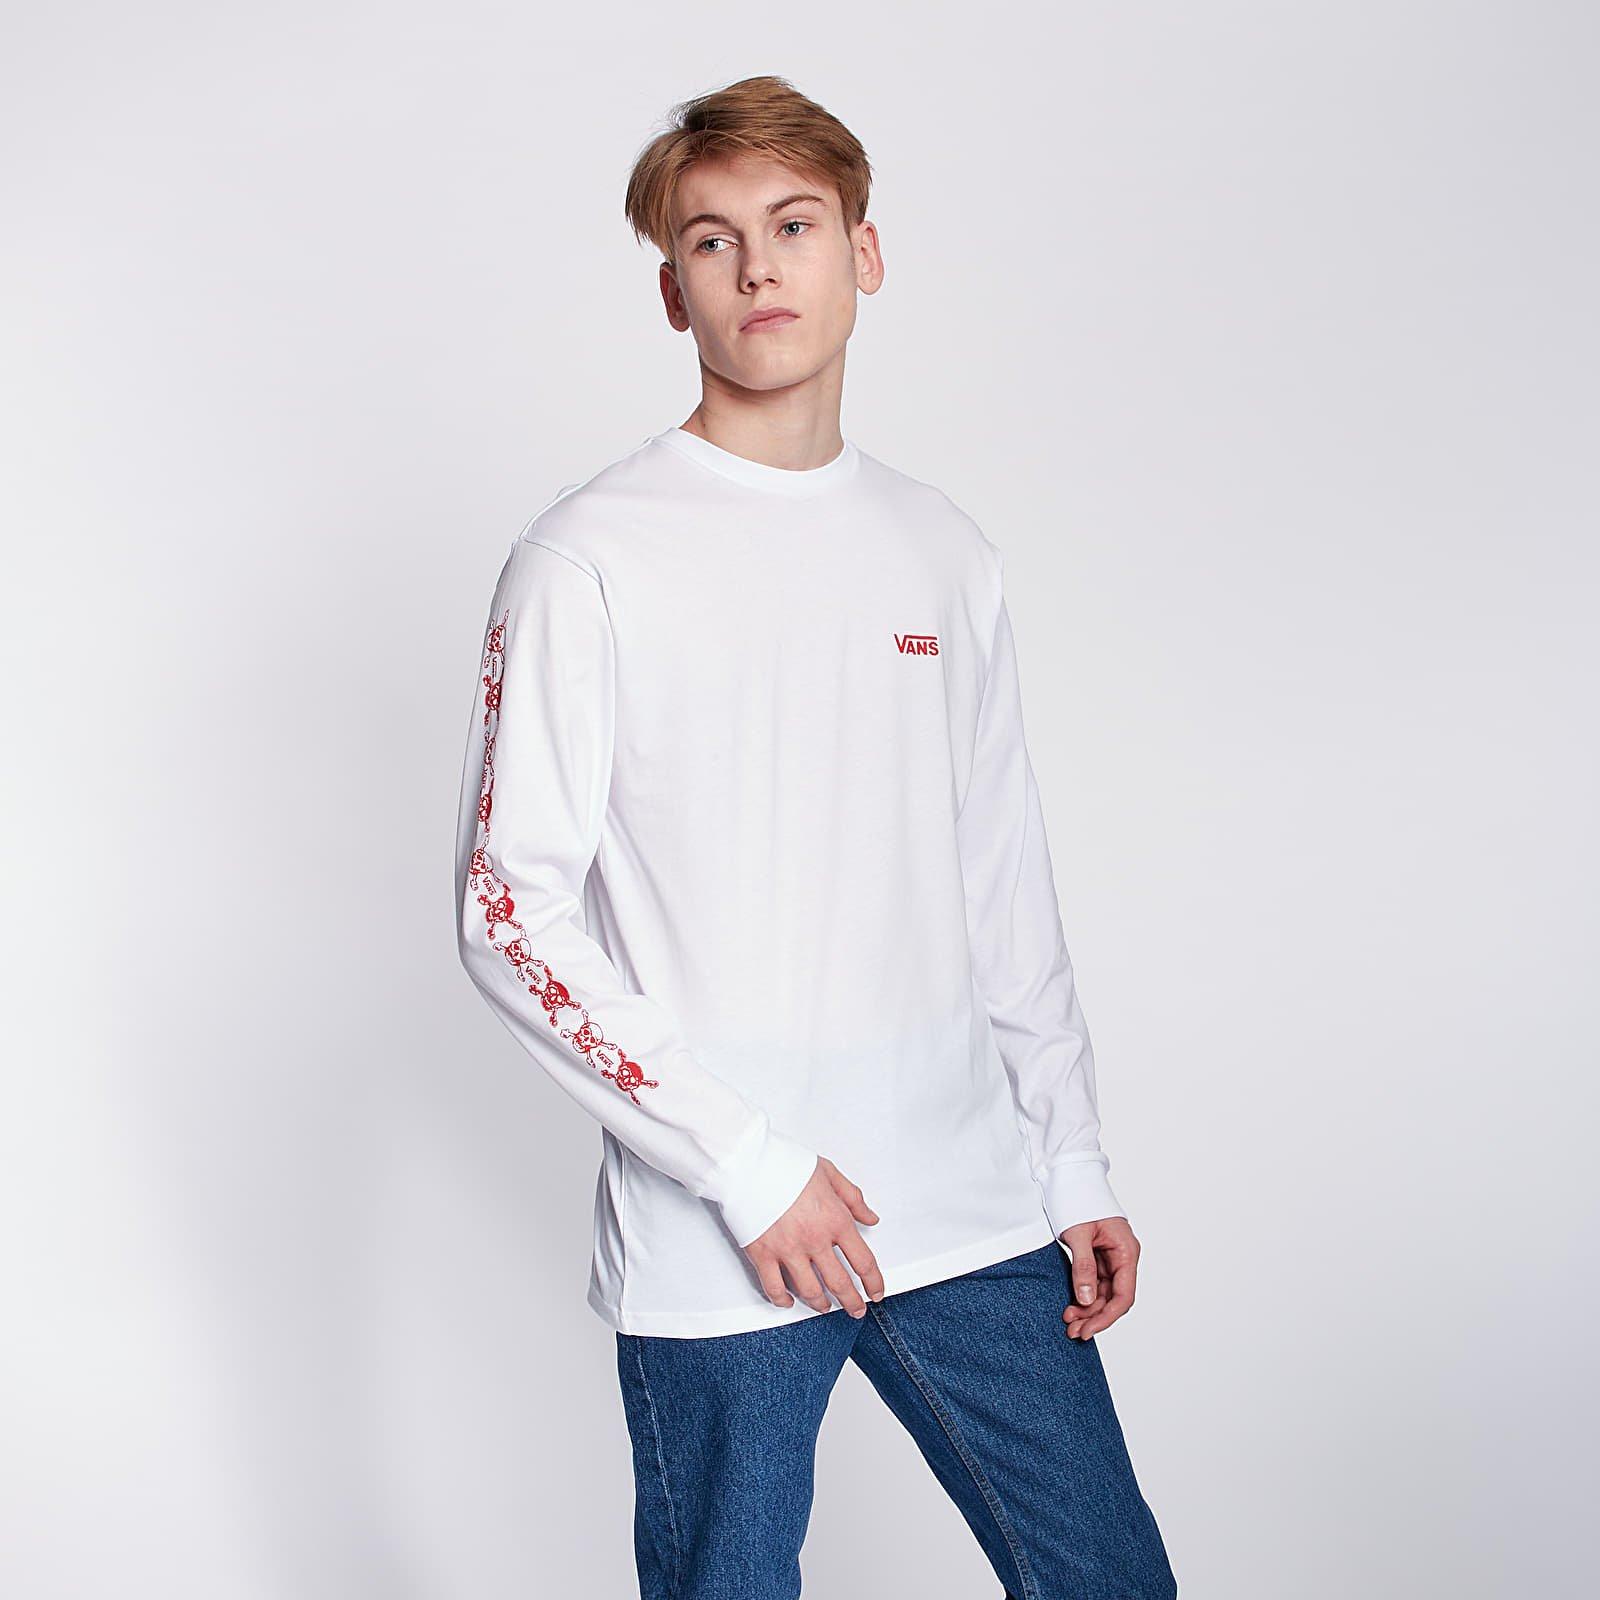 T-shirts Vans Anaheim Factory Long Sleeve Tee White